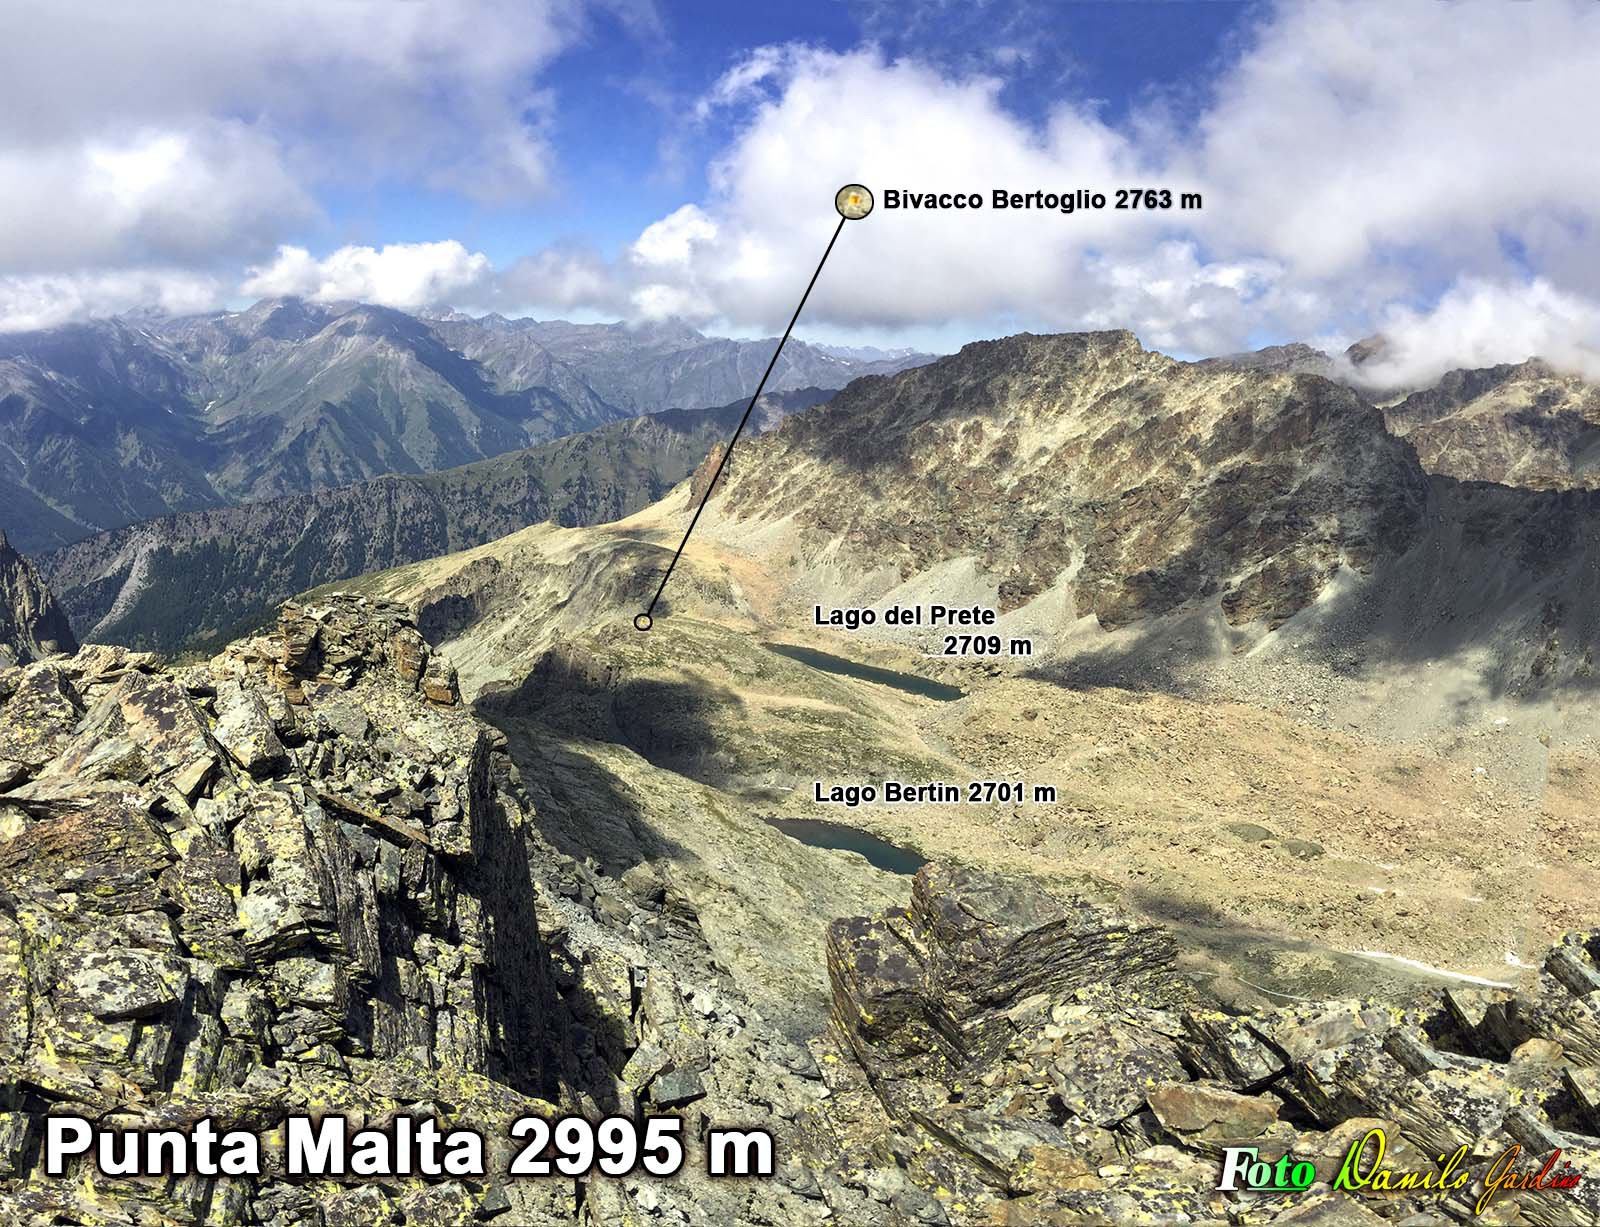 Panorama dalla Punta Malta (2995 m)